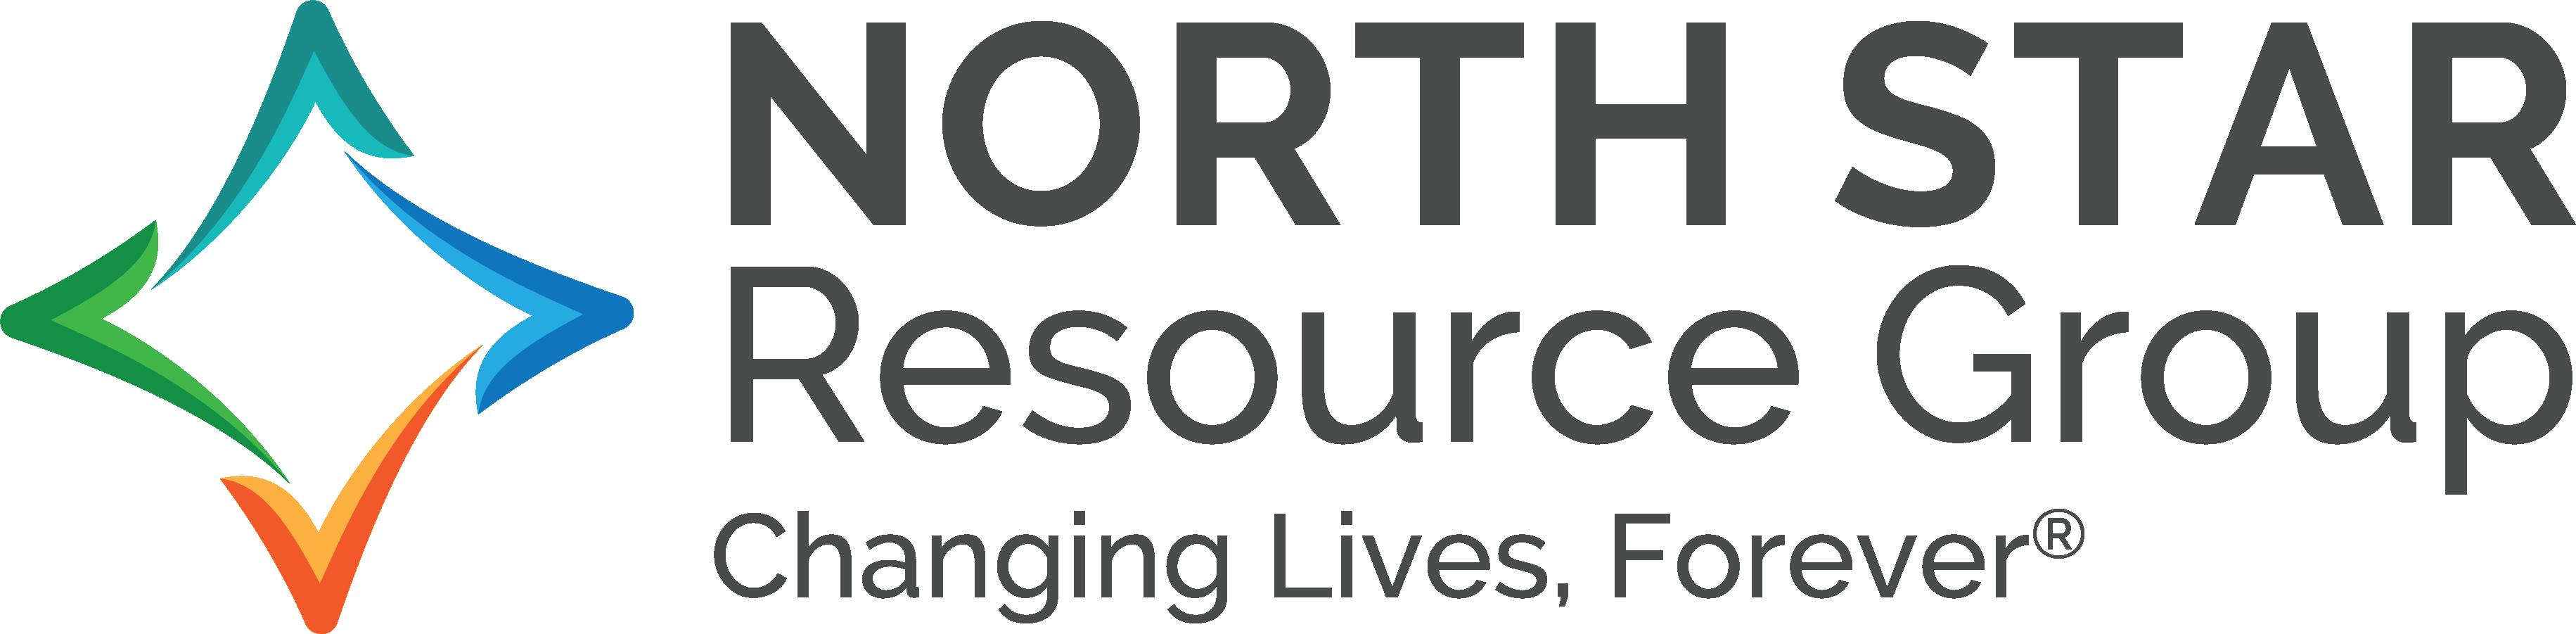 North Star Resource Group Company Logo